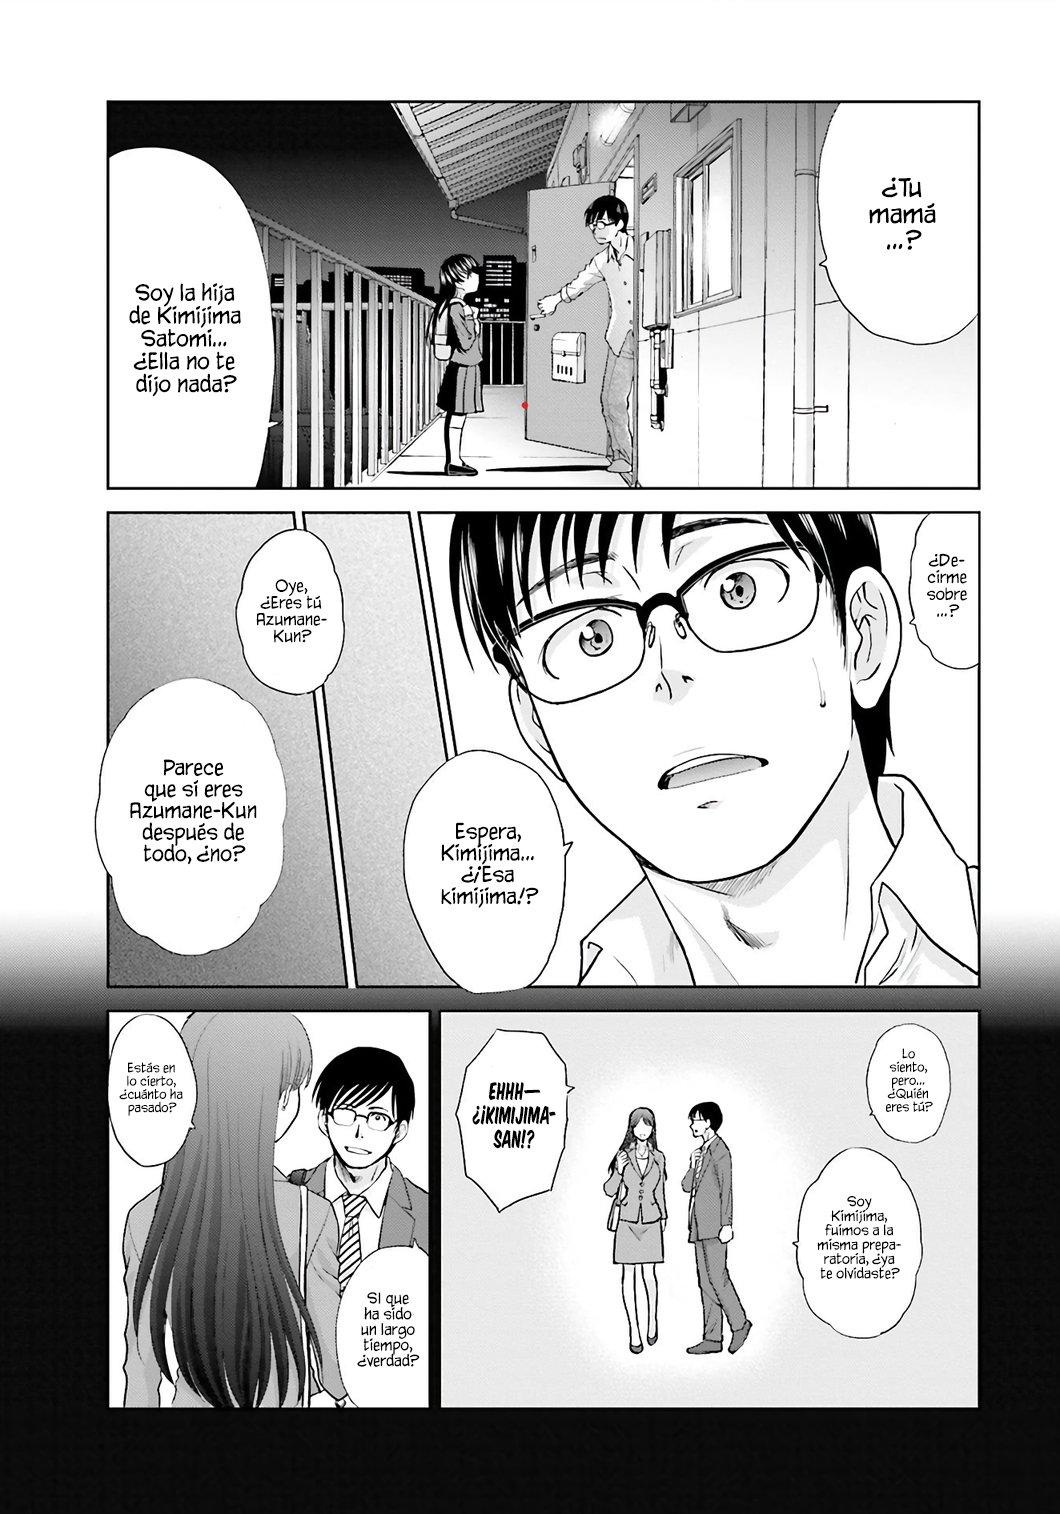 https://nine.mangadogs.com/es_manga/pic8/48/36656/946258/68c1f25dcbd82e048c6d723b16b456df.jpg Page 10